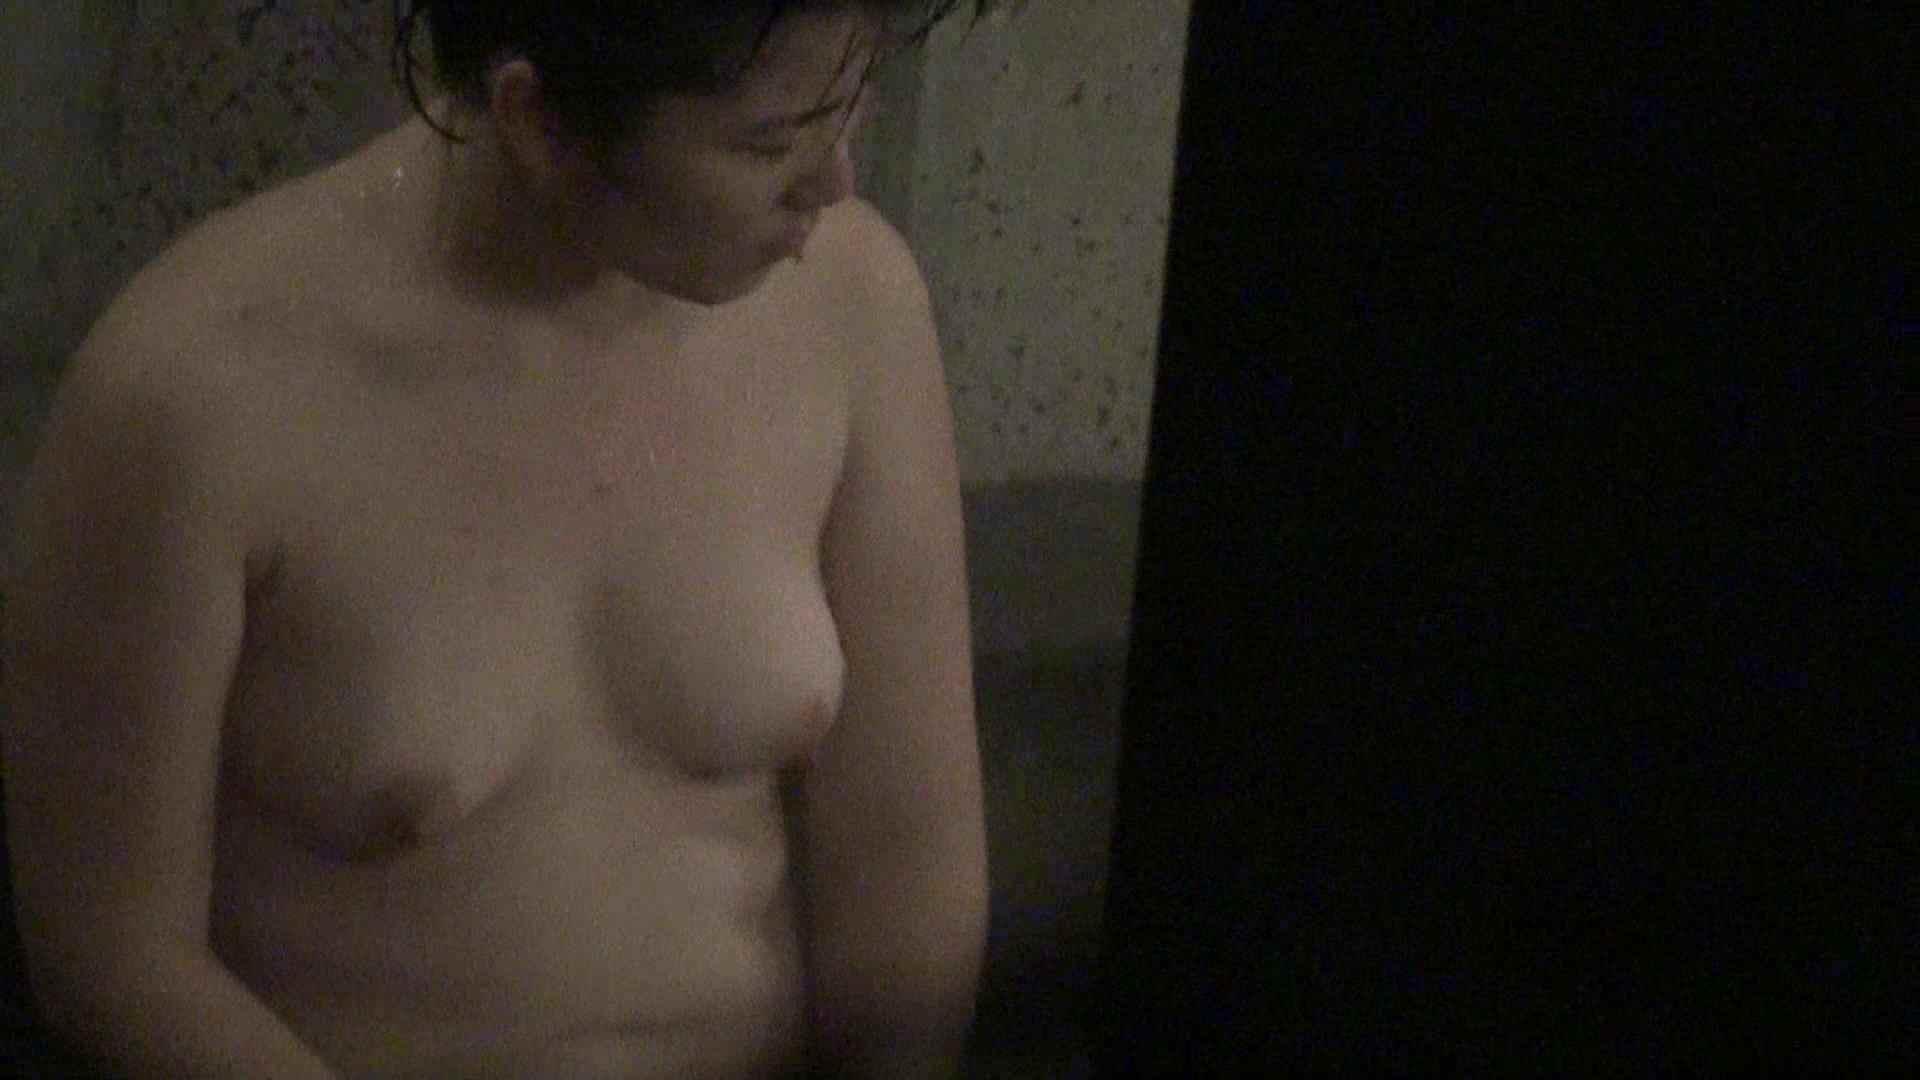 Aquaな露天風呂Vol.334 露天風呂突入 のぞき動画画像 102pic 47